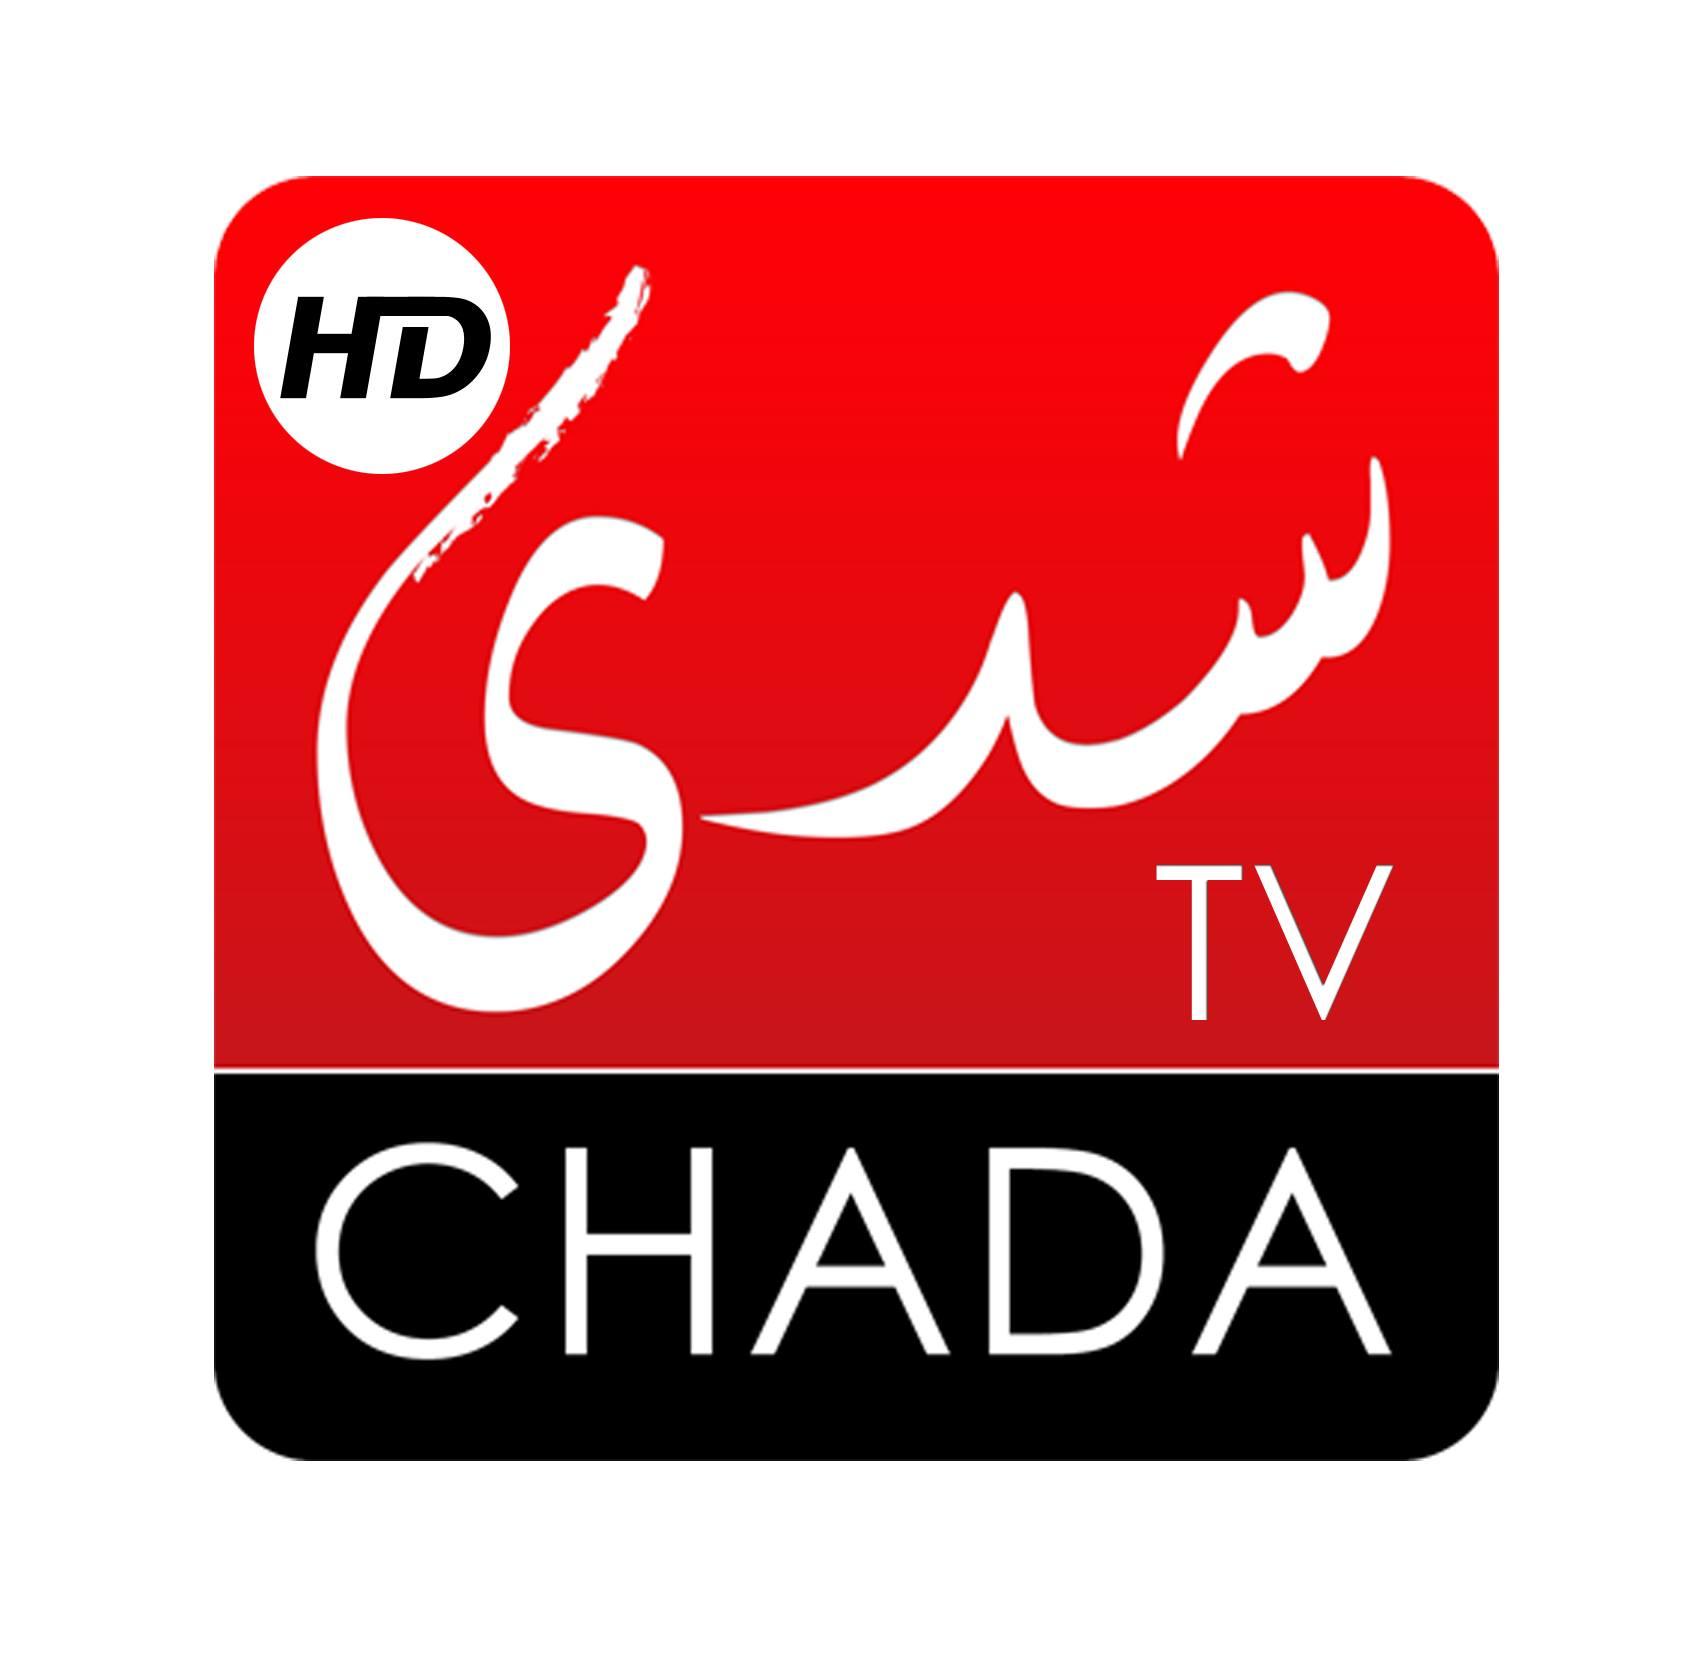 chadatv